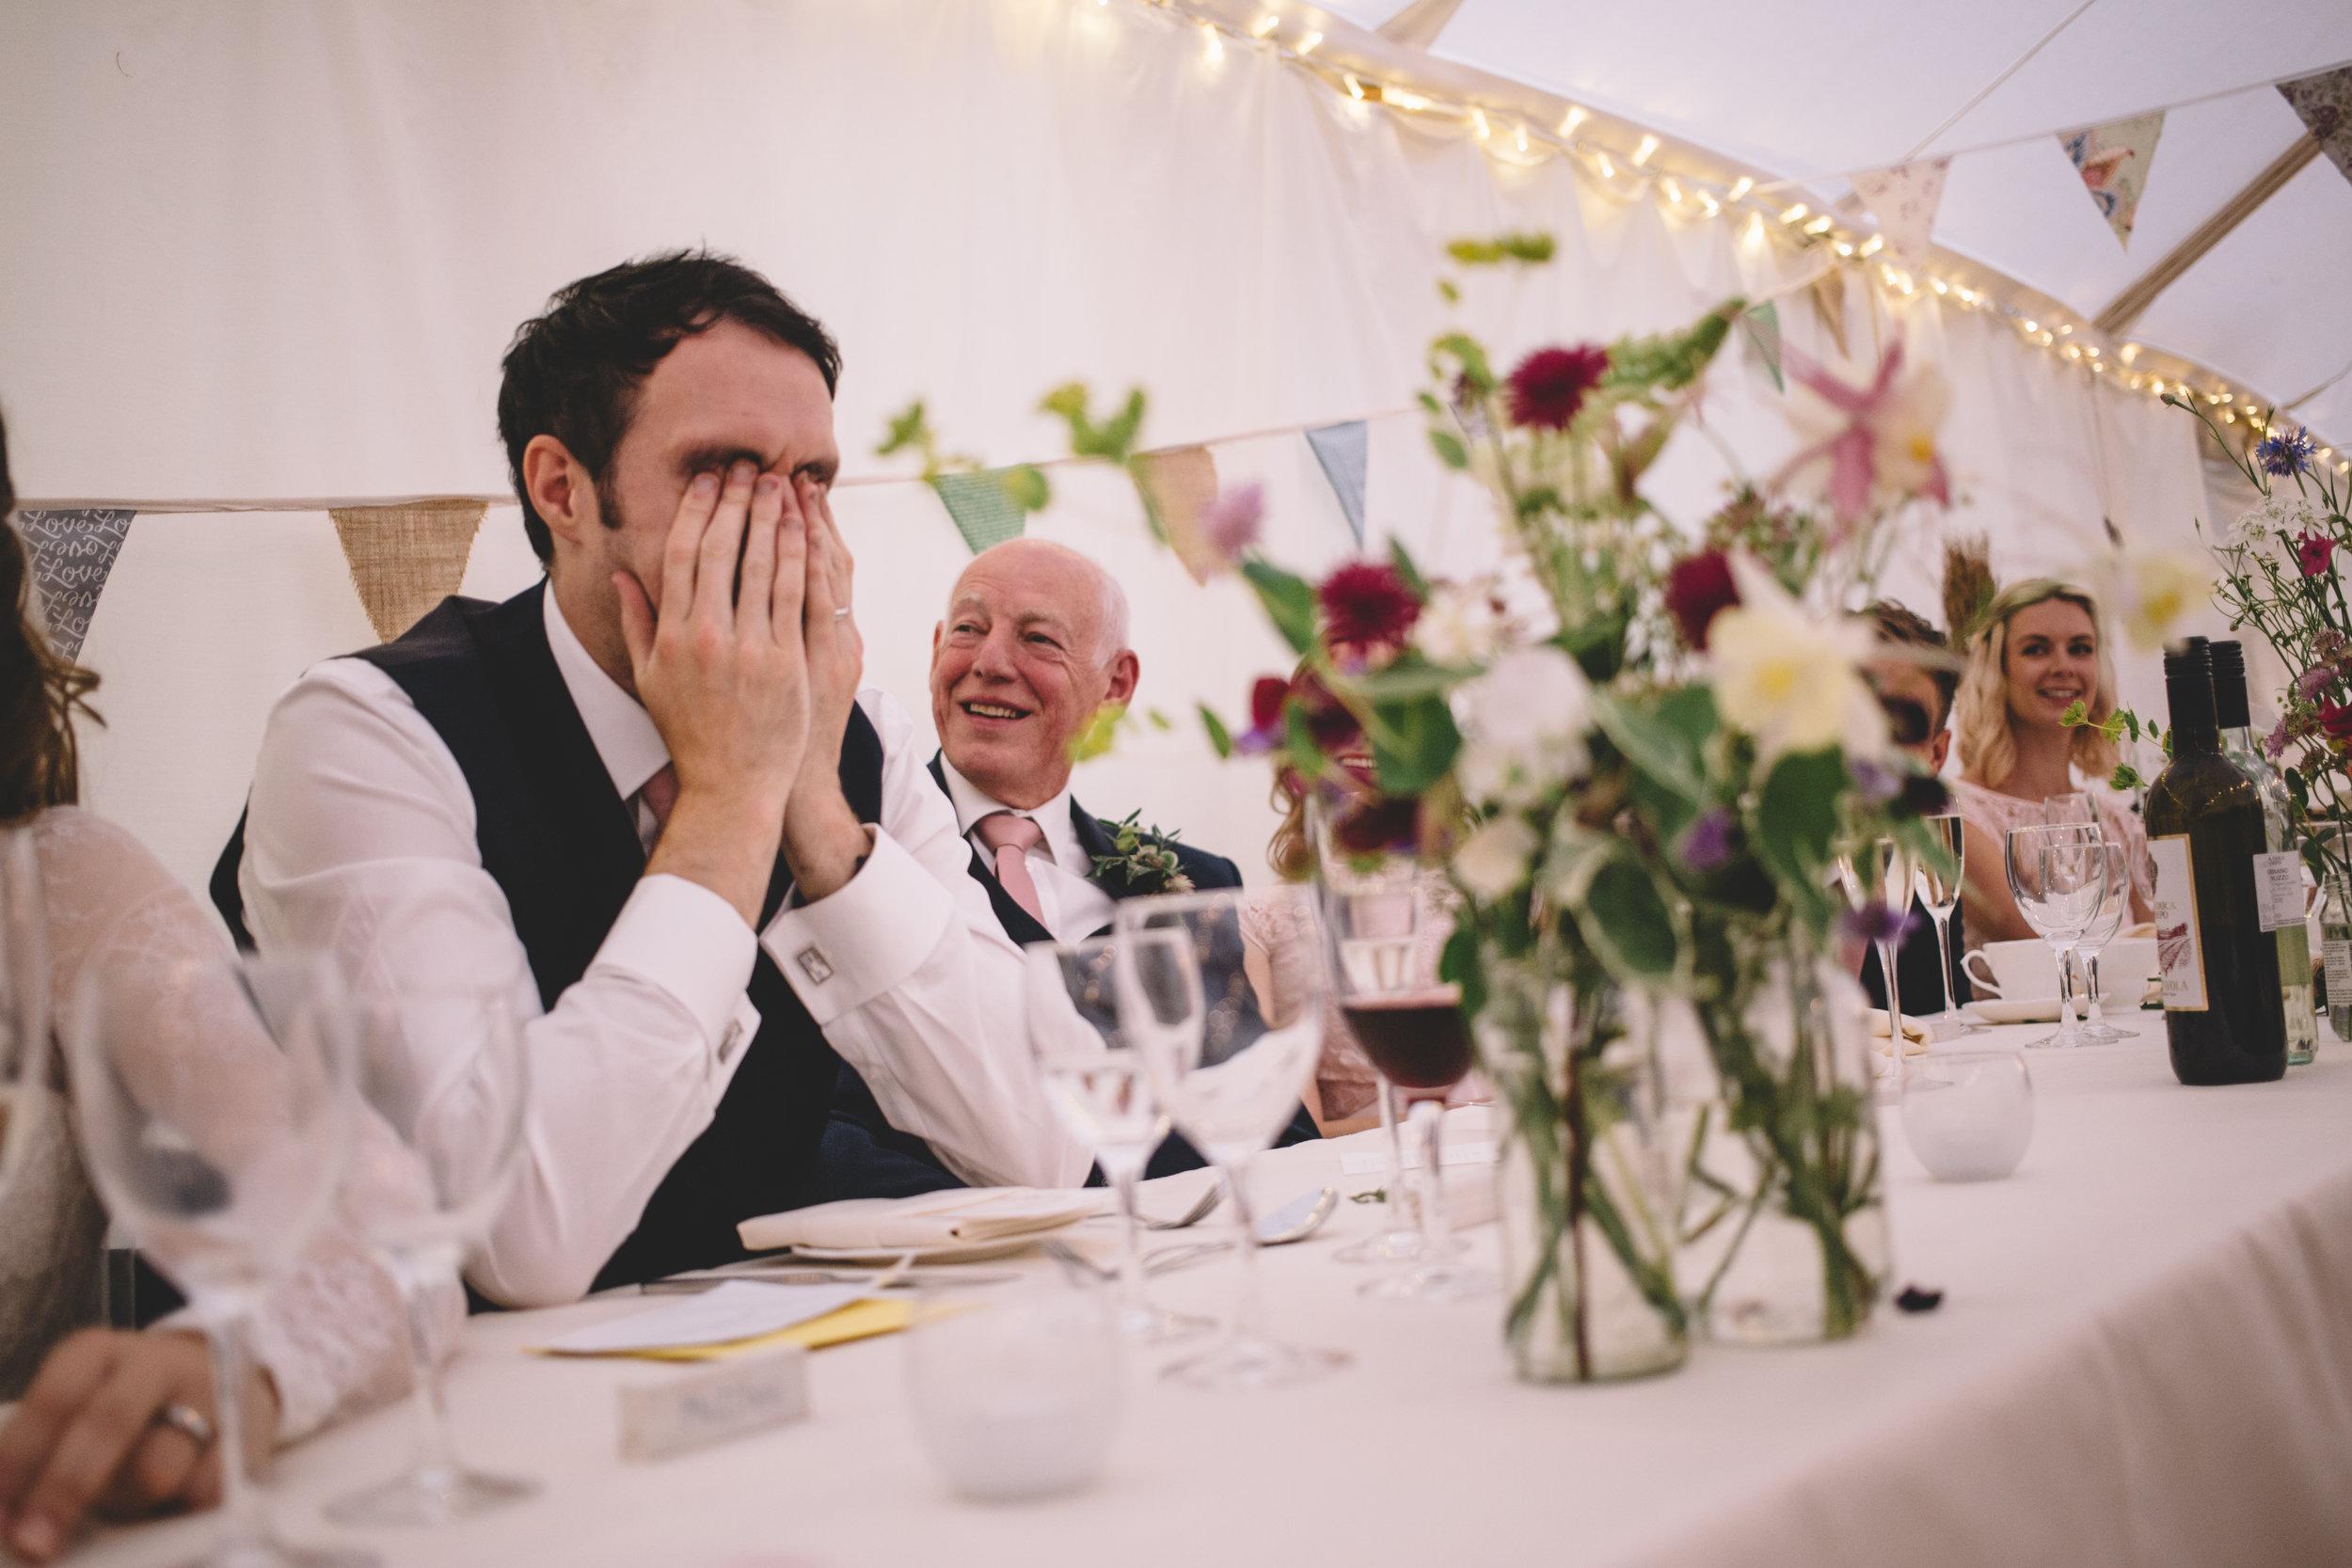 Garden Marquee Lancashire Wedding Photographer, Claire Basiuk Photography-45.jpg